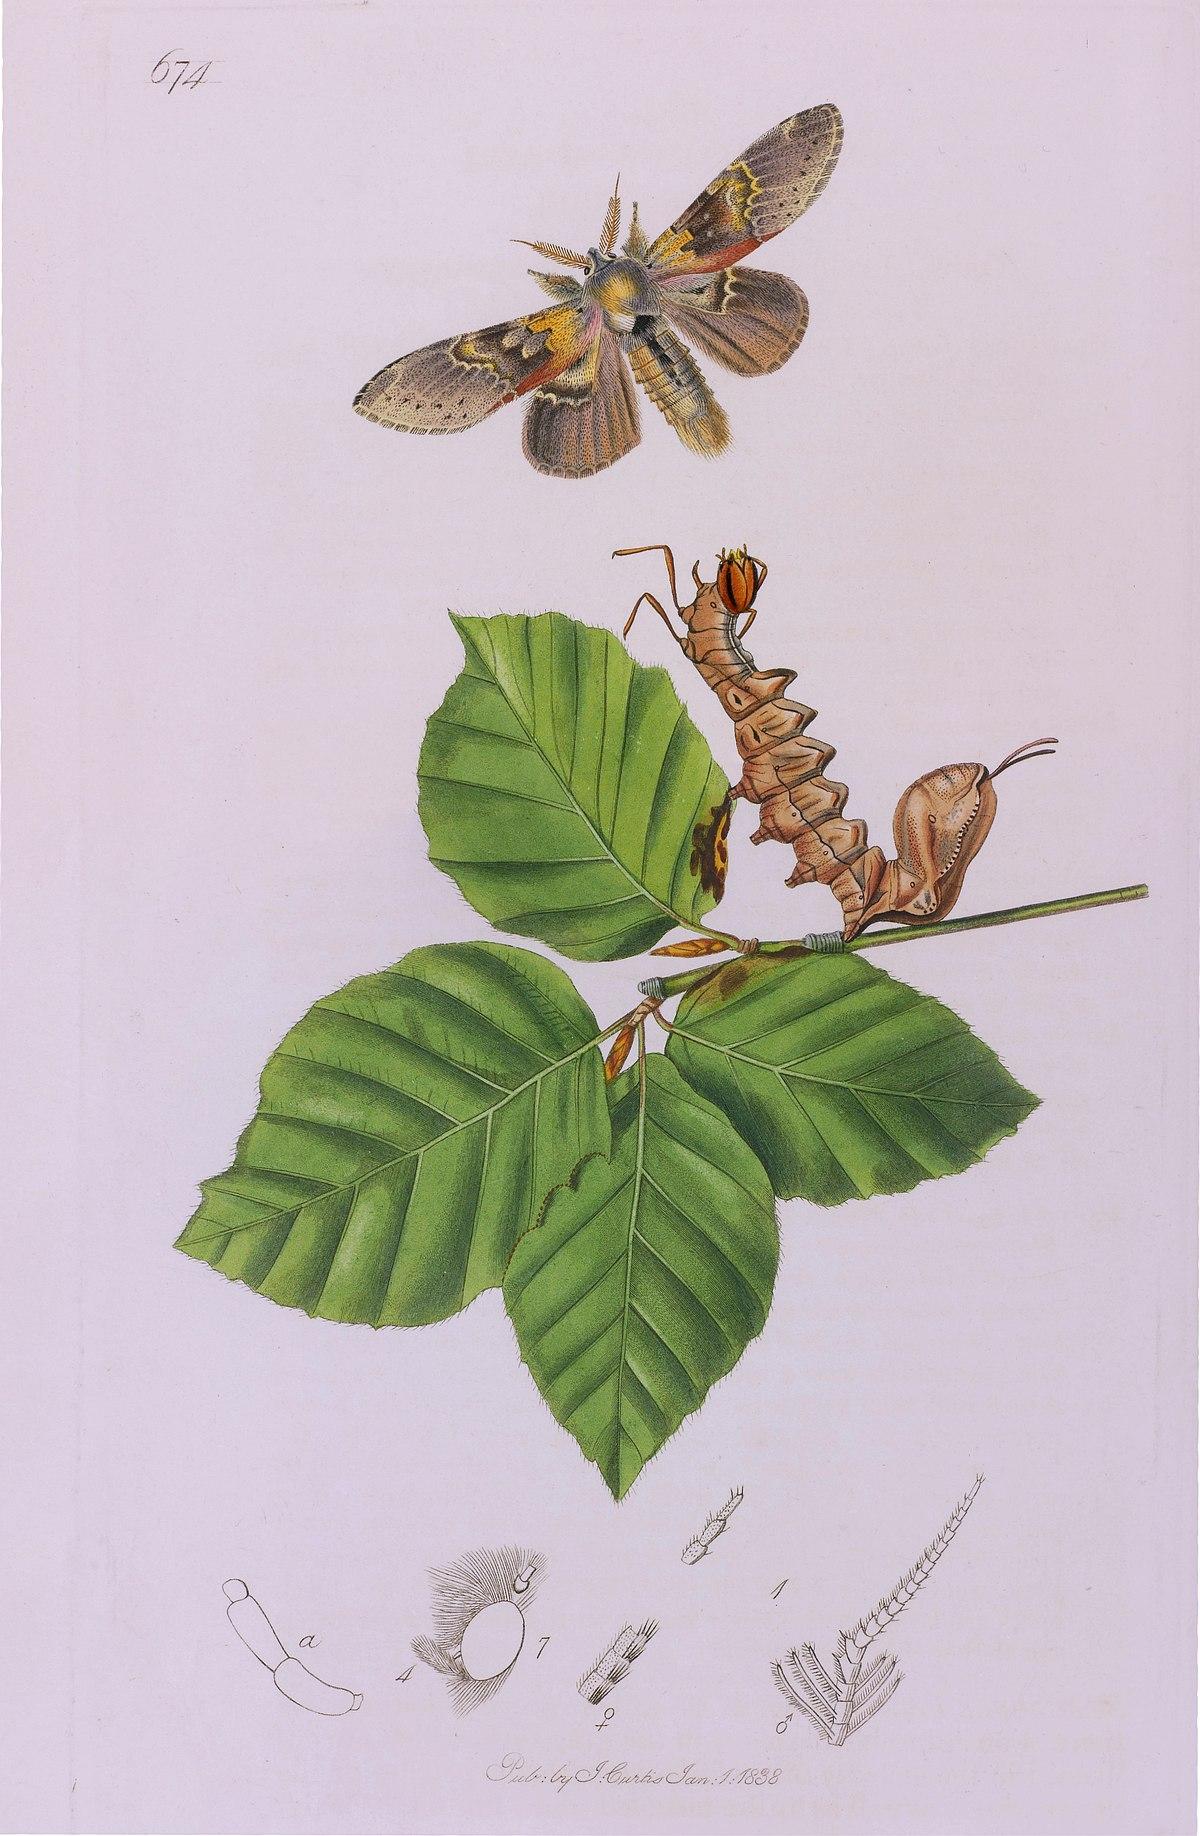 1200px John Curtis British Entomology Plate 674 Lobster Moth Stauropus fagi